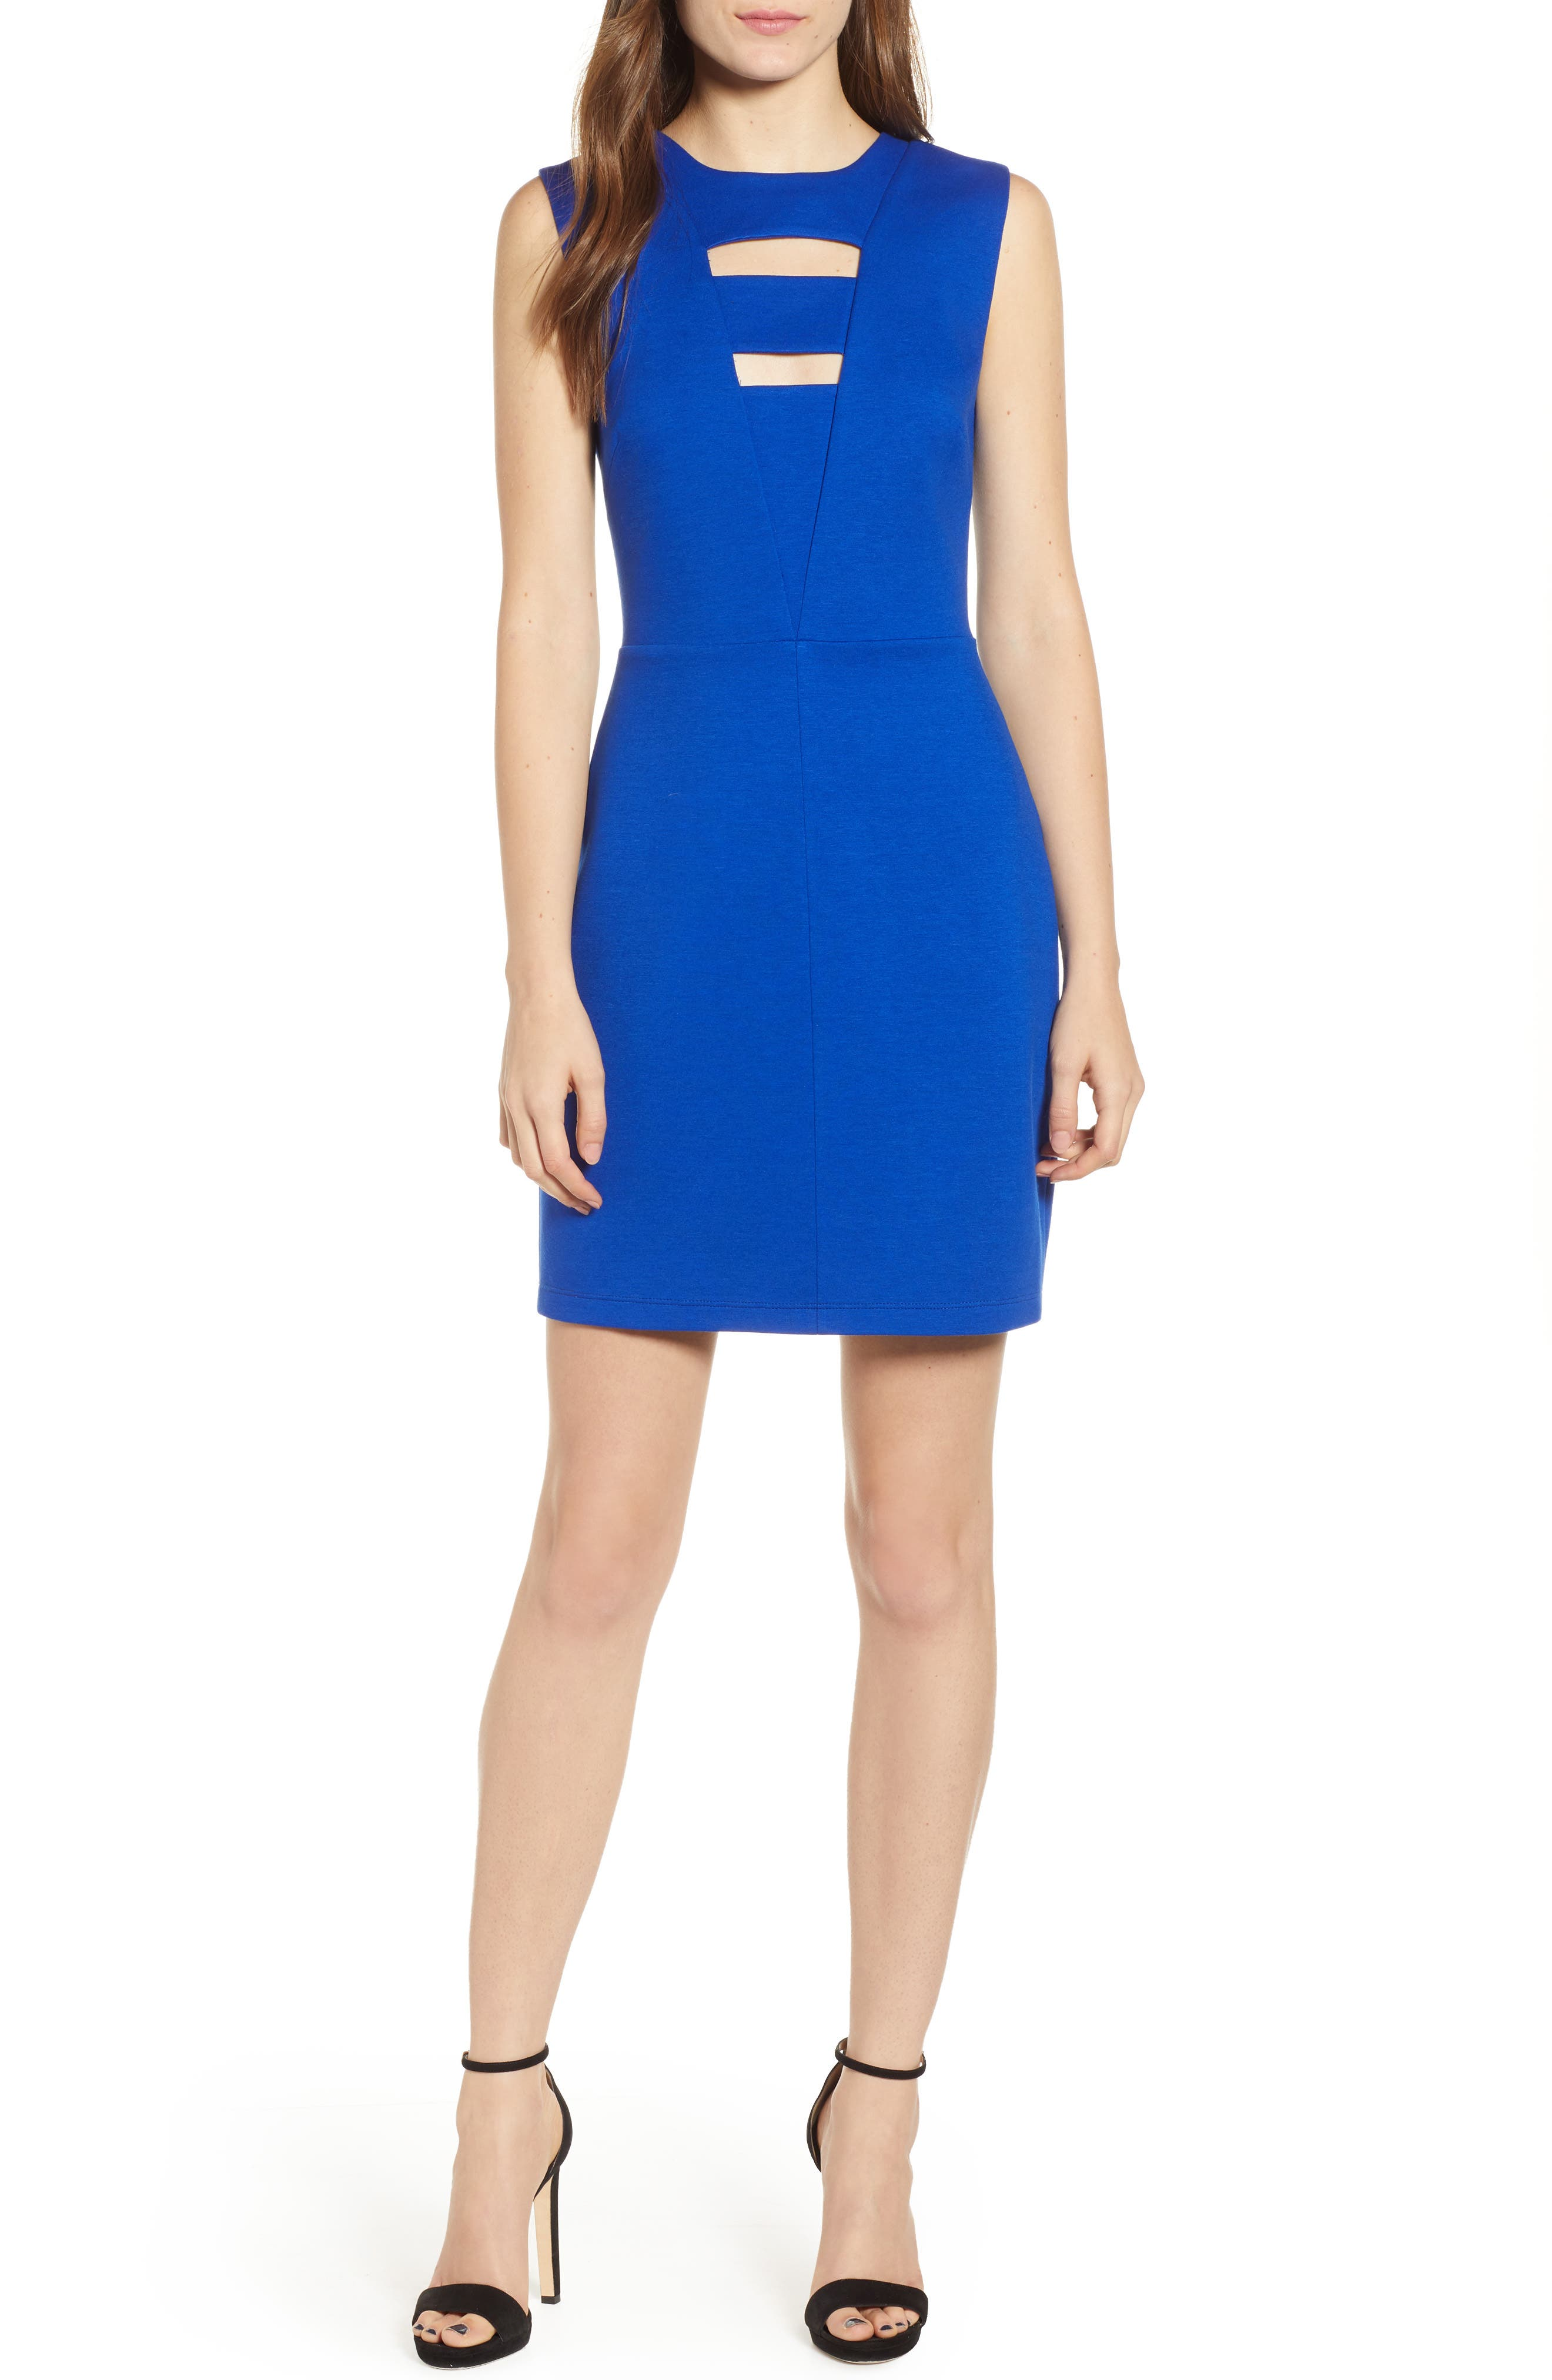 BAILEY44 No Love Lost Cutout Ponte Dress in Blue